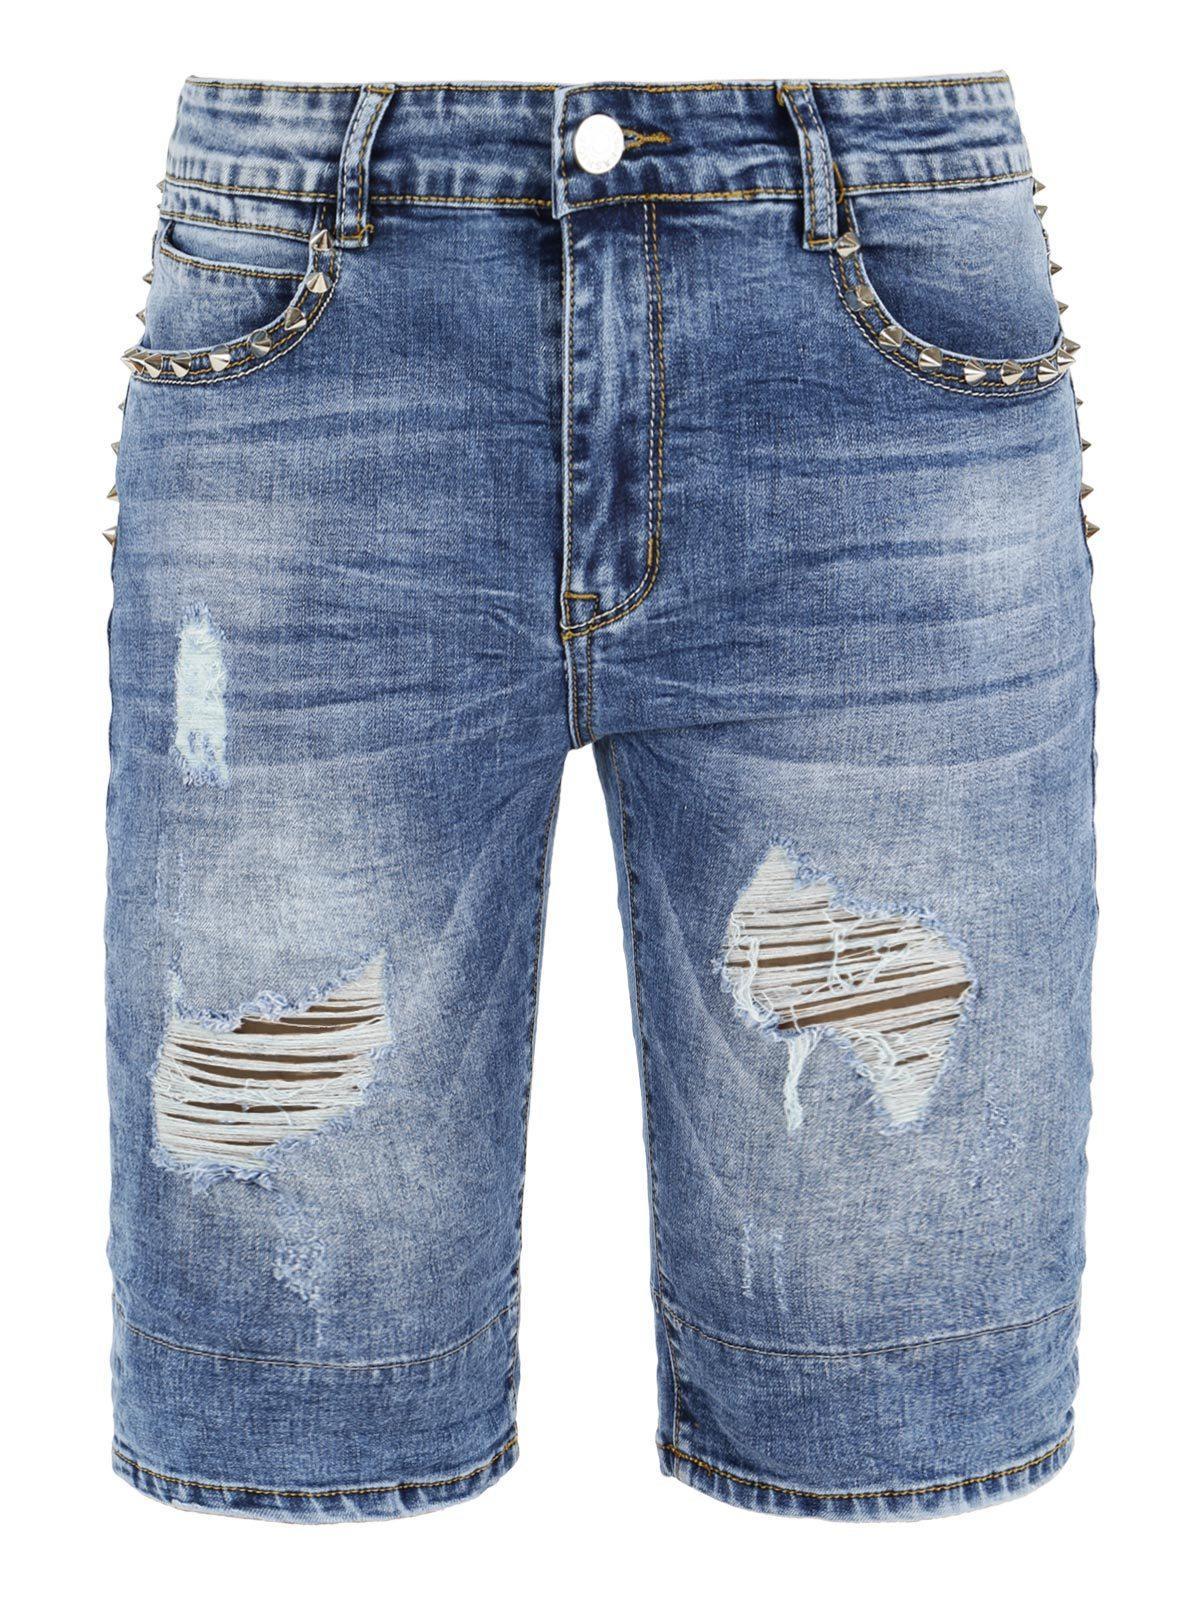 jeans corto slavato strappi